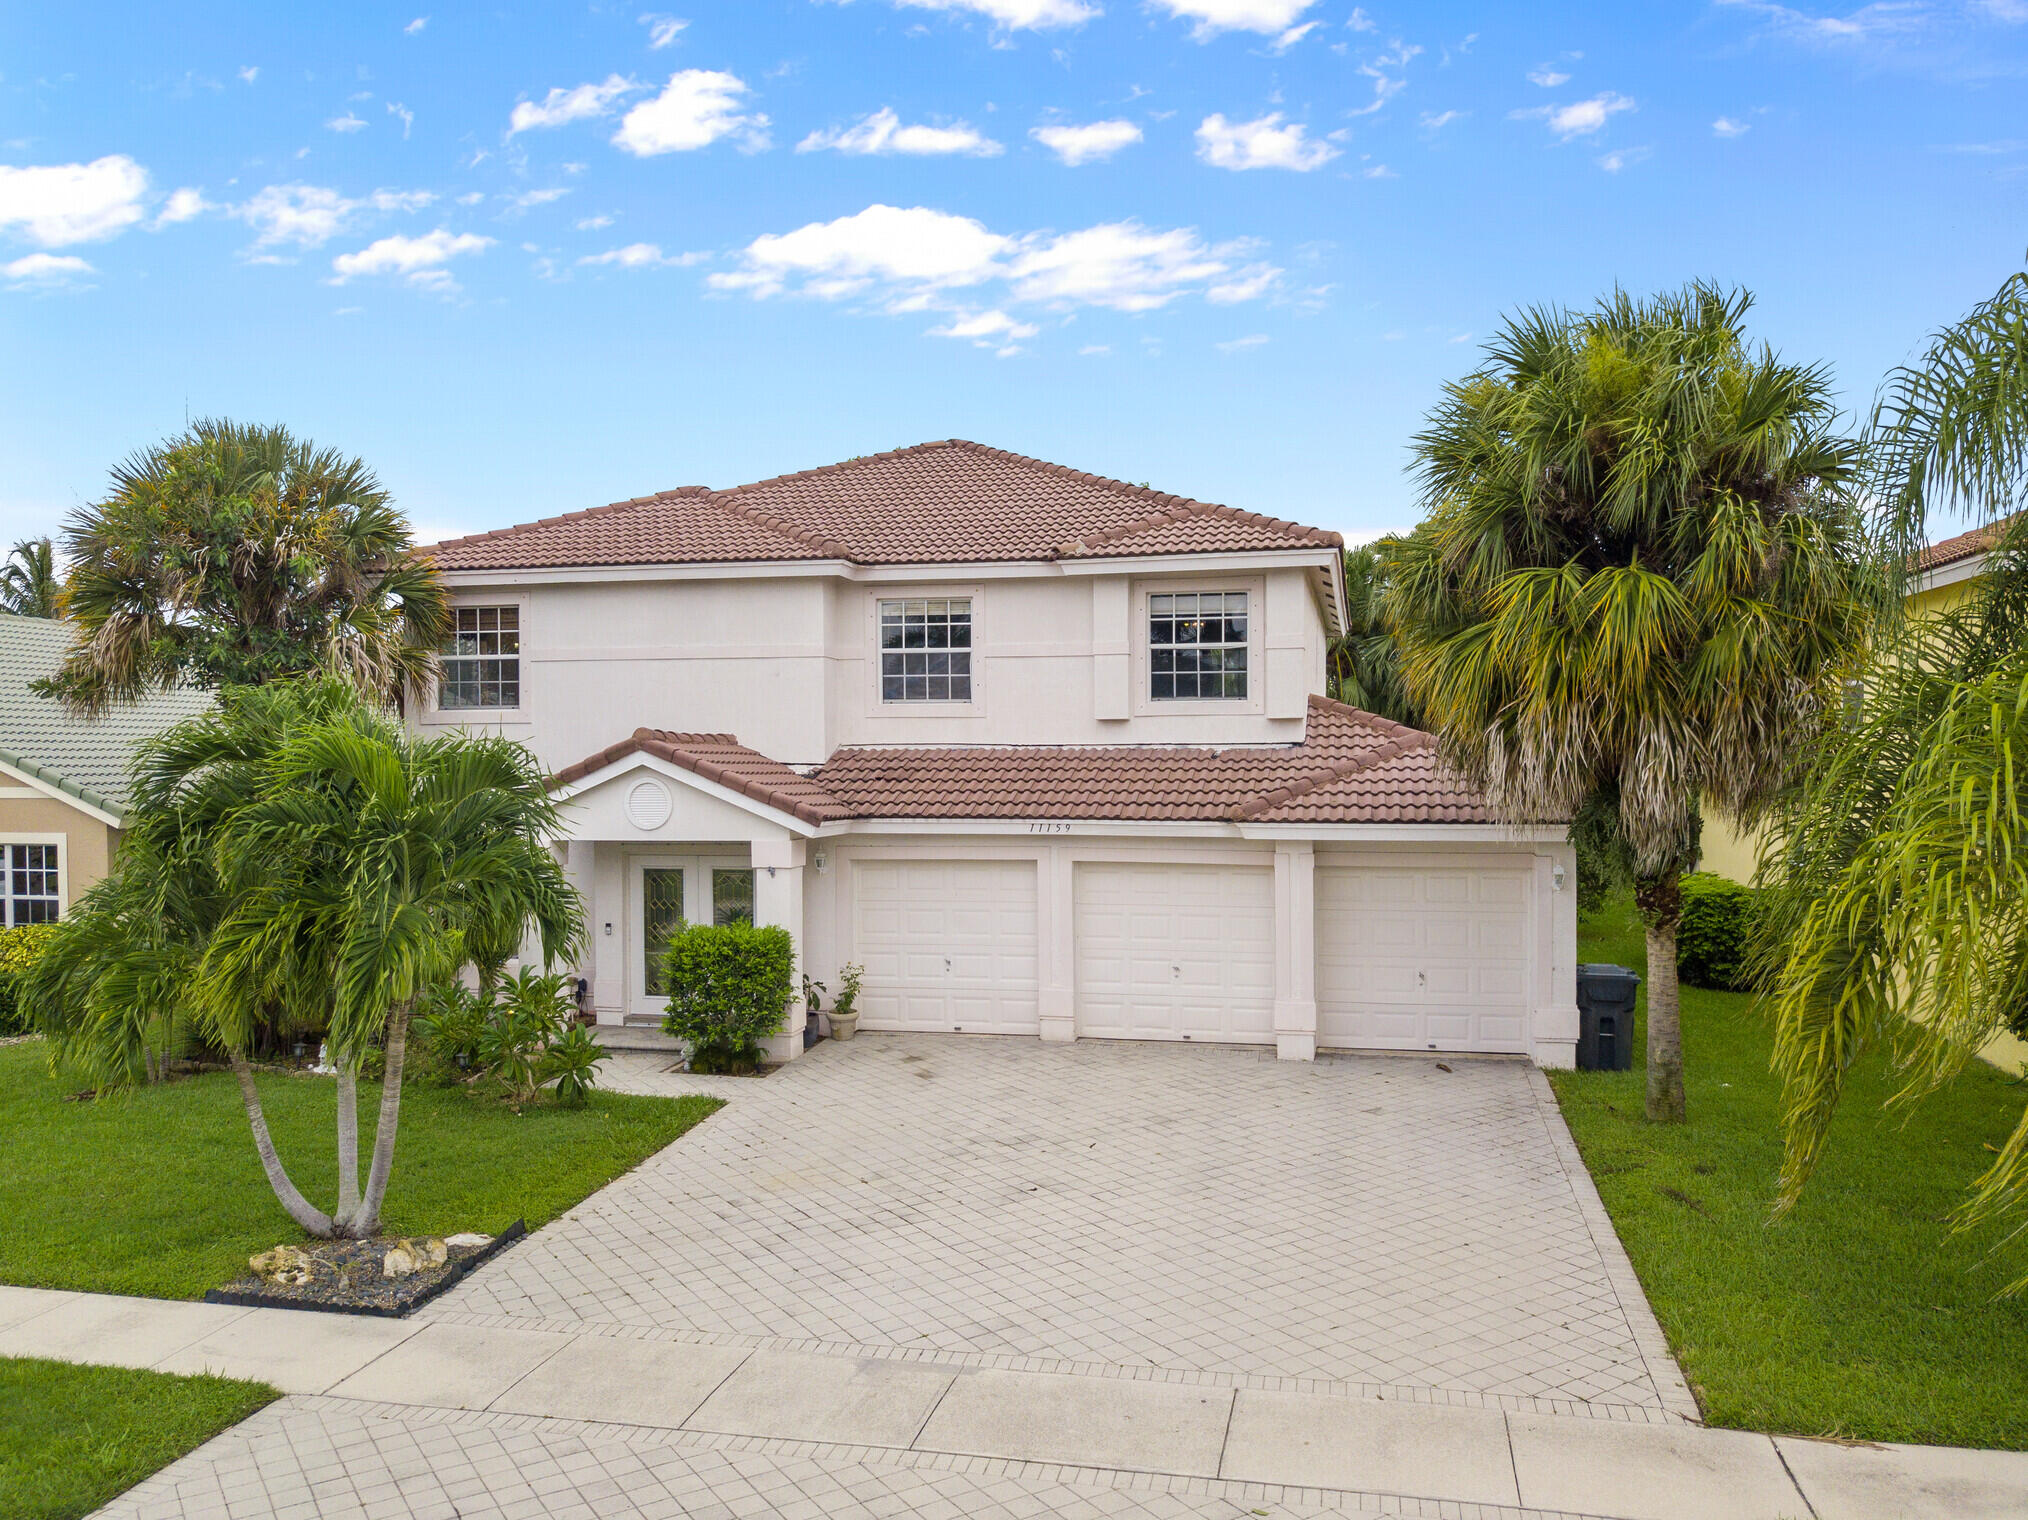 11159  Nantucket Bay Court  For Sale 10742780, FL